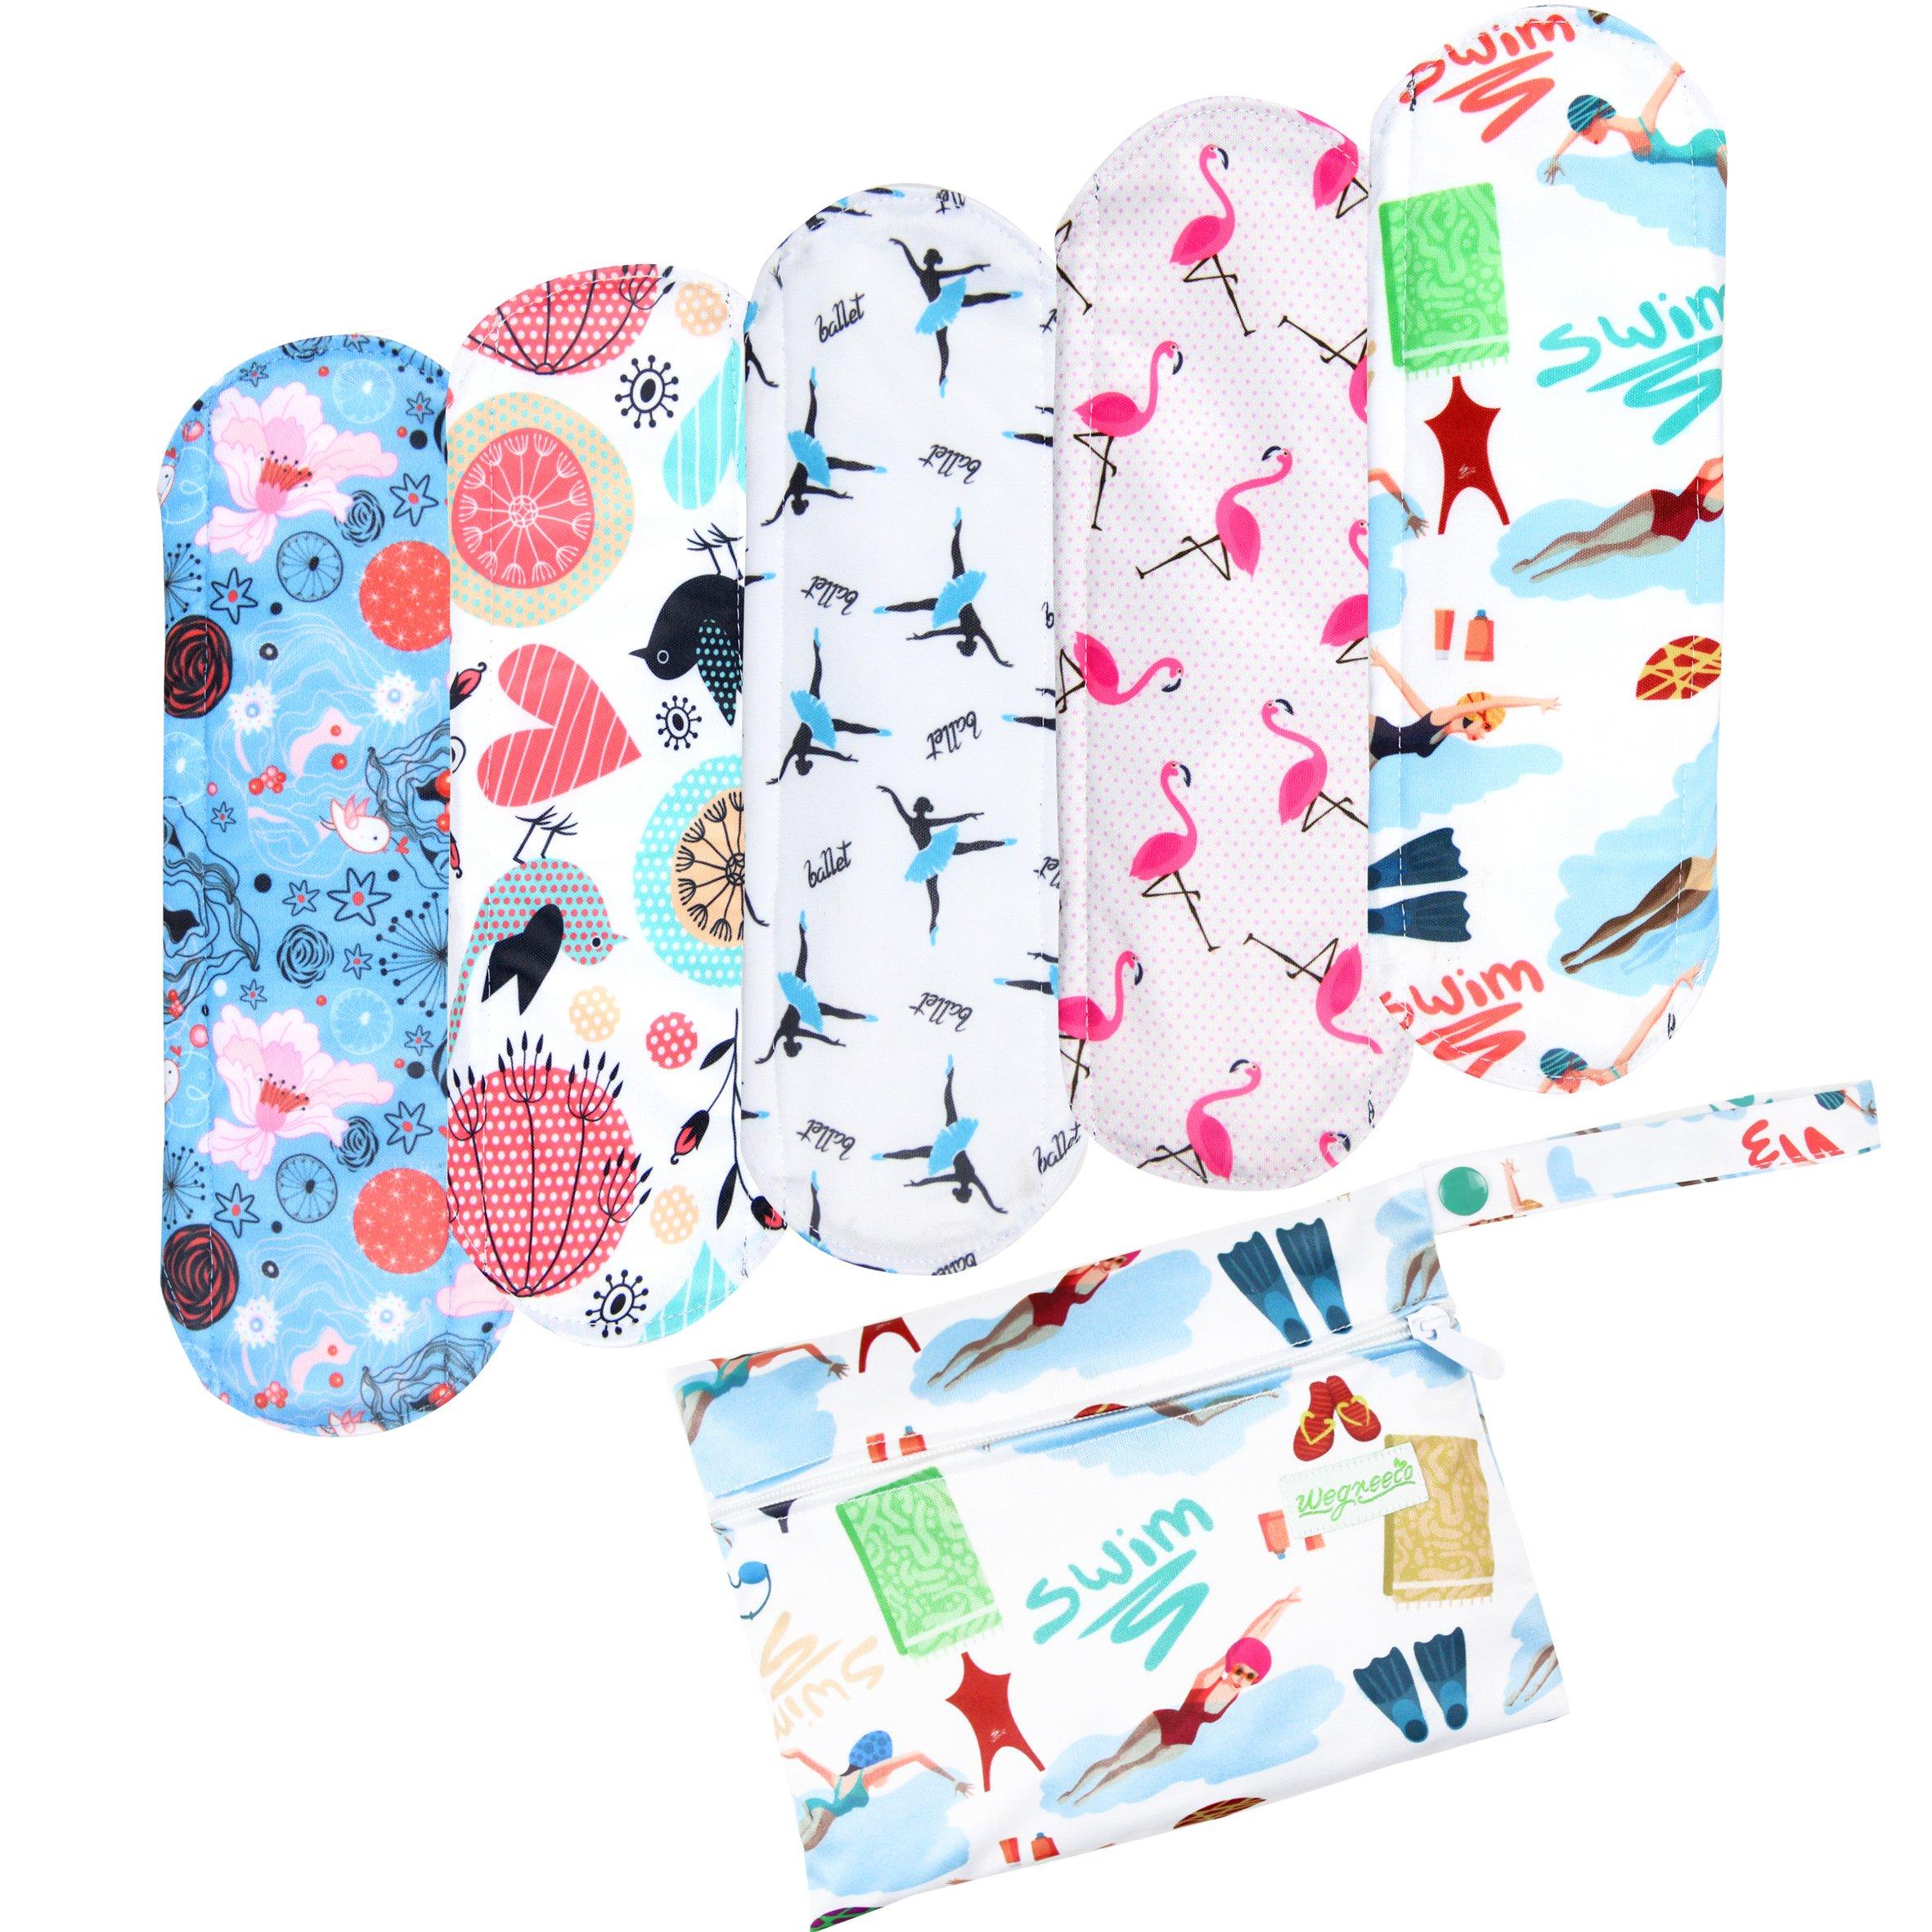 Wegreeco Bamboo Reusable Sanitary Pads (New Pattern)- Cloth Sanitary Pads, Cloth Pads, Reusable Menstrual Pads - 5 Pack Pads, 1 Cloth Mini Wet Bag Bonus ( Small, Dynamic )